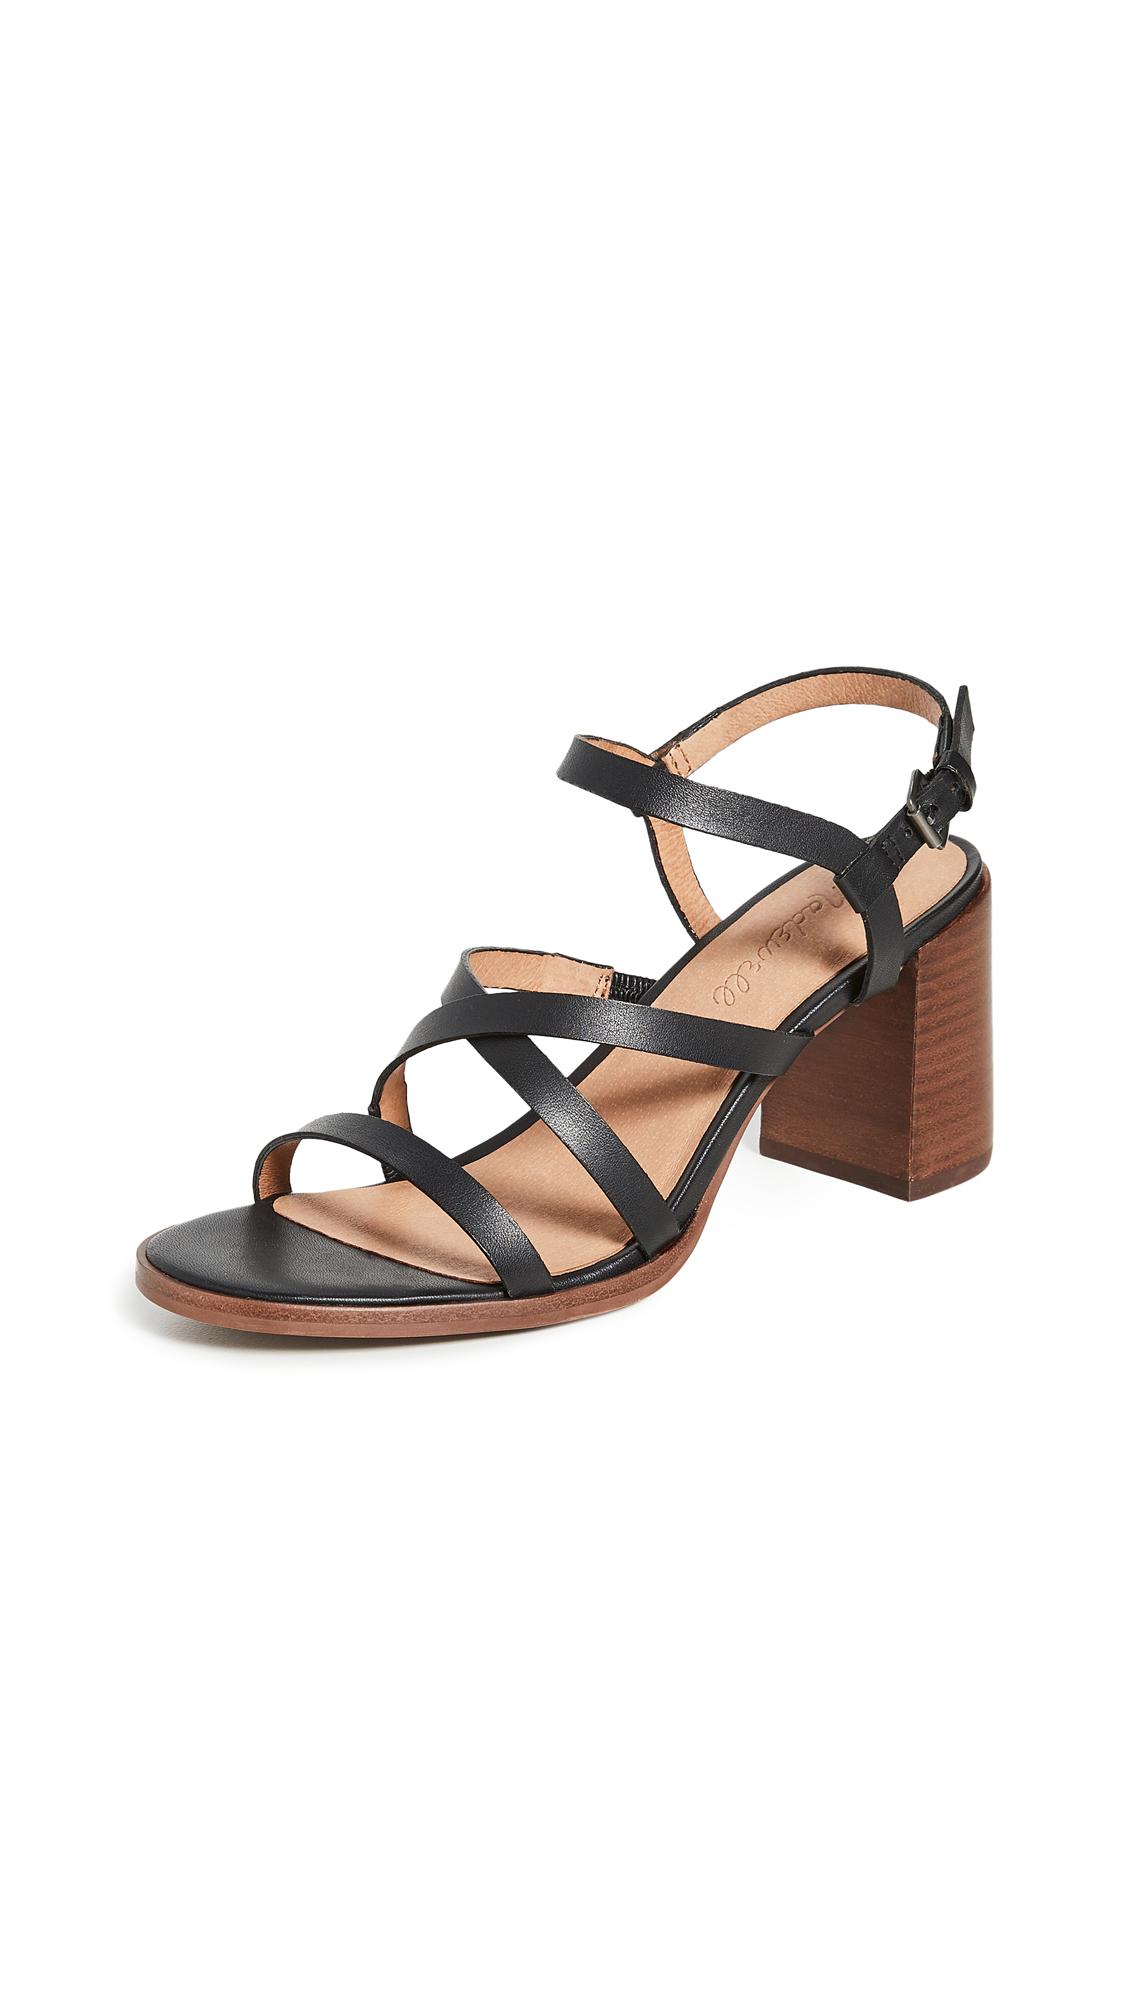 Madewell Sabine Skinny Strap Heeled Sandals - 50% Off Sale